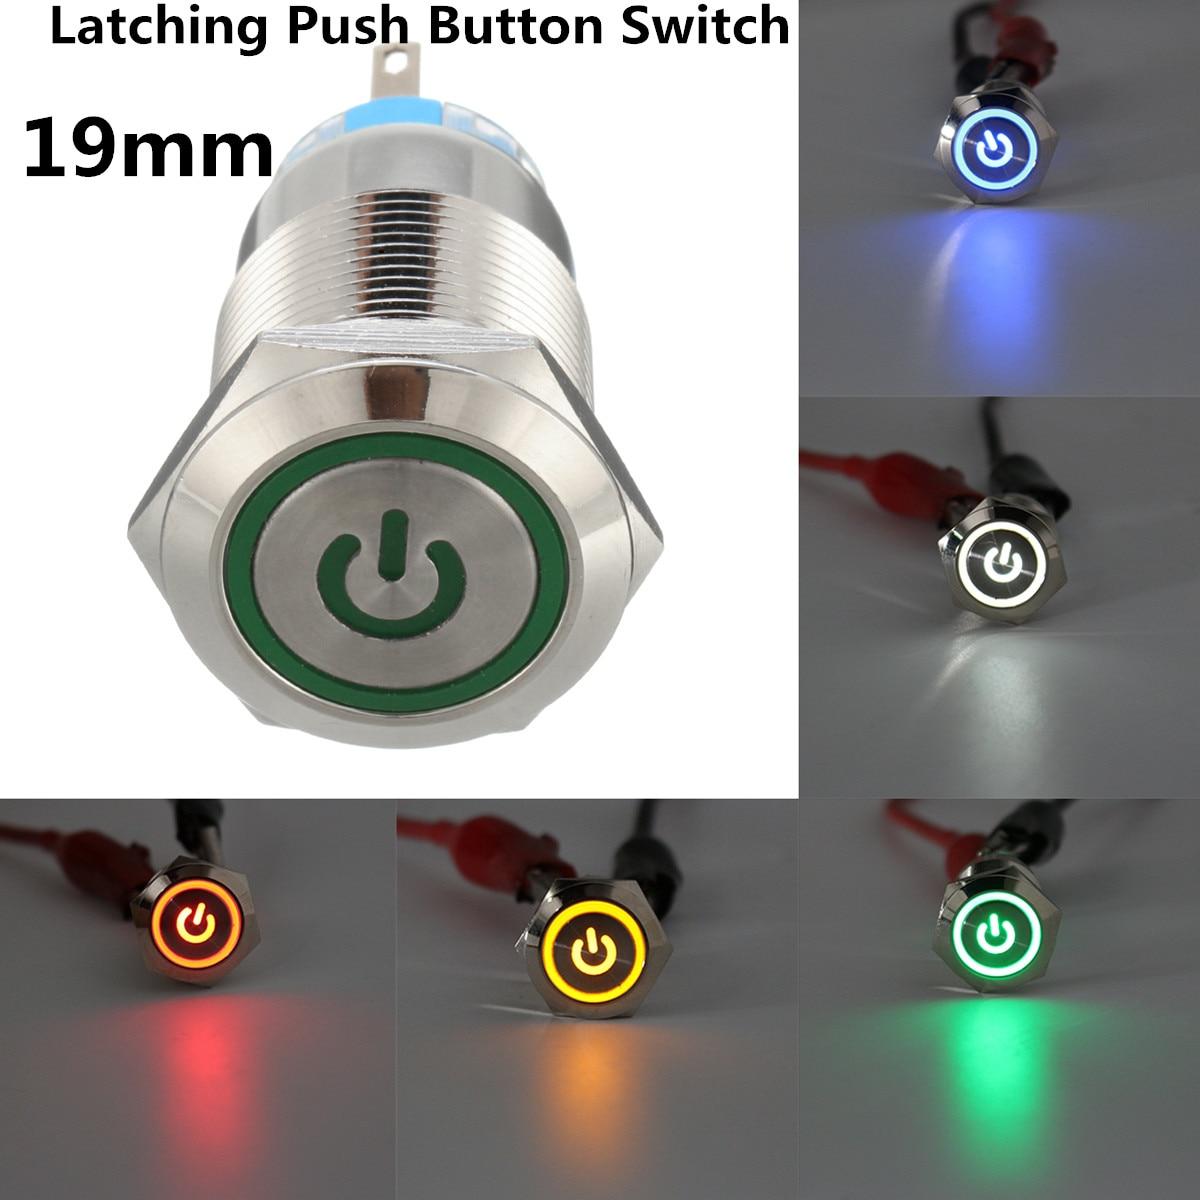 Blue On//Off Latching Push Button Switch Locking Car Dashboard Dash Boat 12V